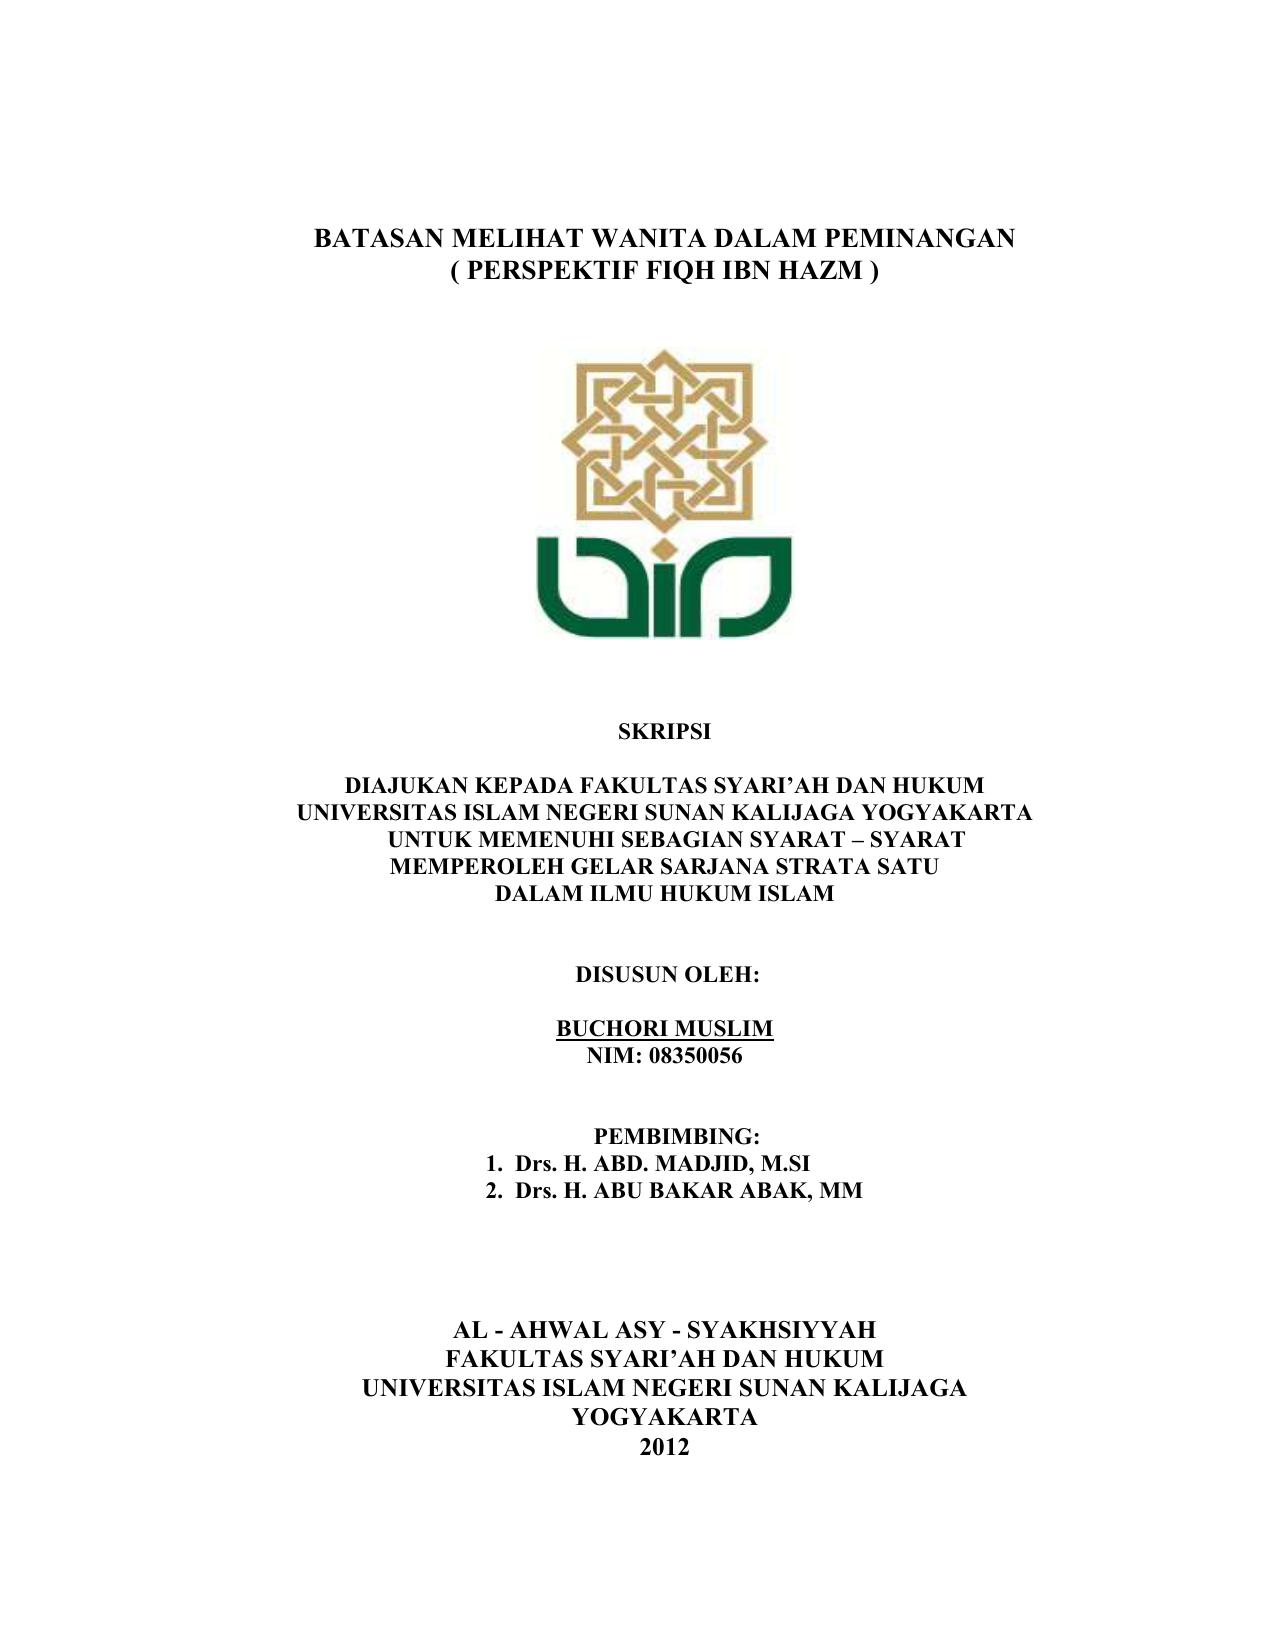 Skripsi Buchori Muslim Digital Library Uin Sunan Kalijaga